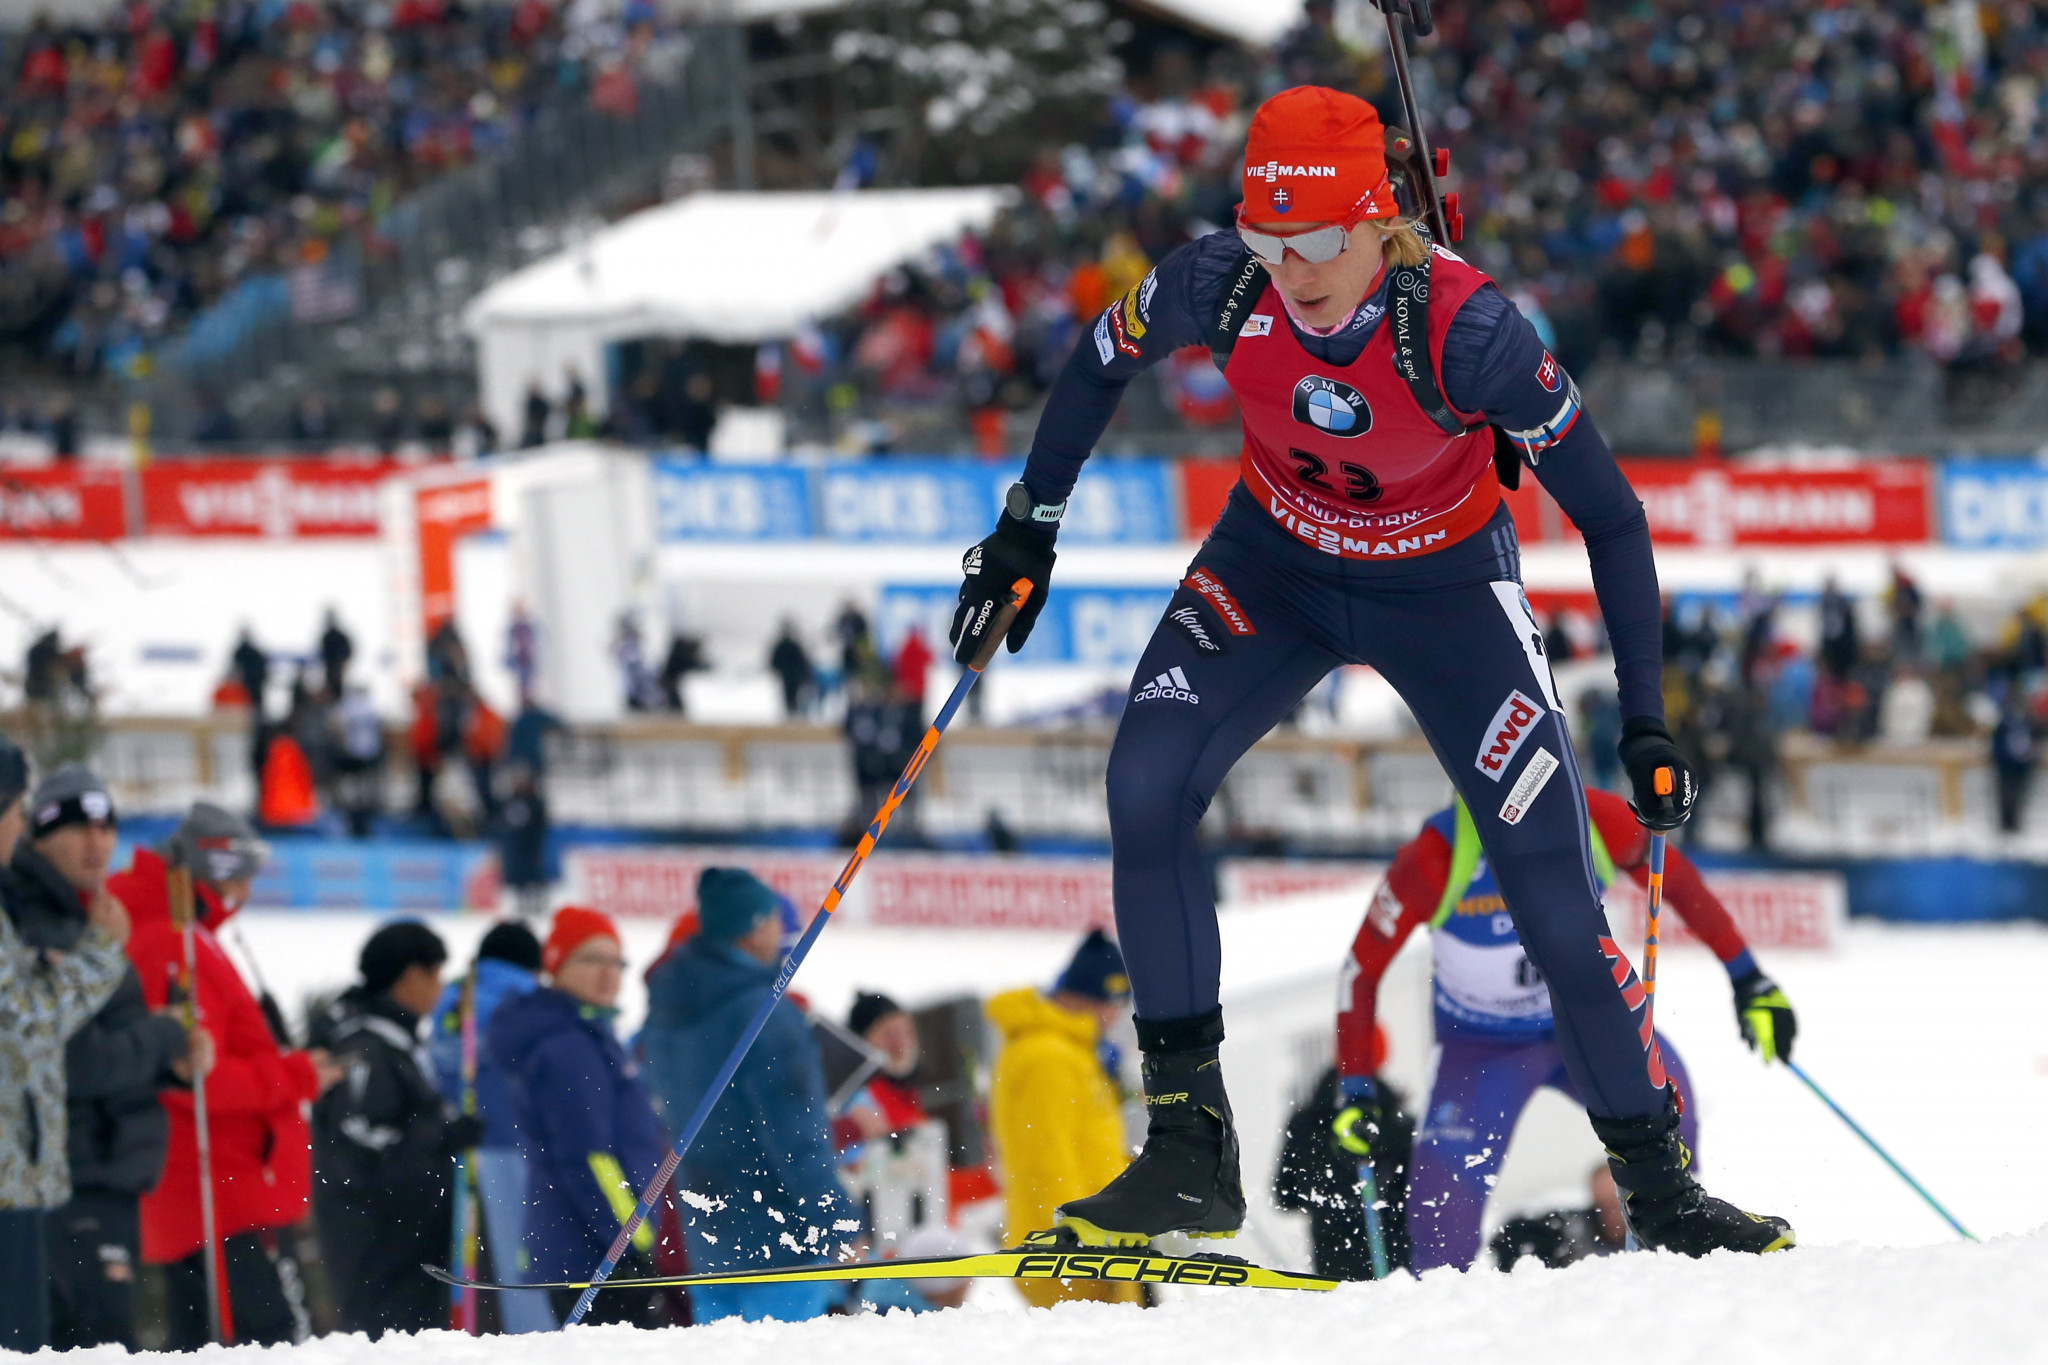 Anastasiya Kuzmina enjoyed a comfortable margin of victory ©Getty Images